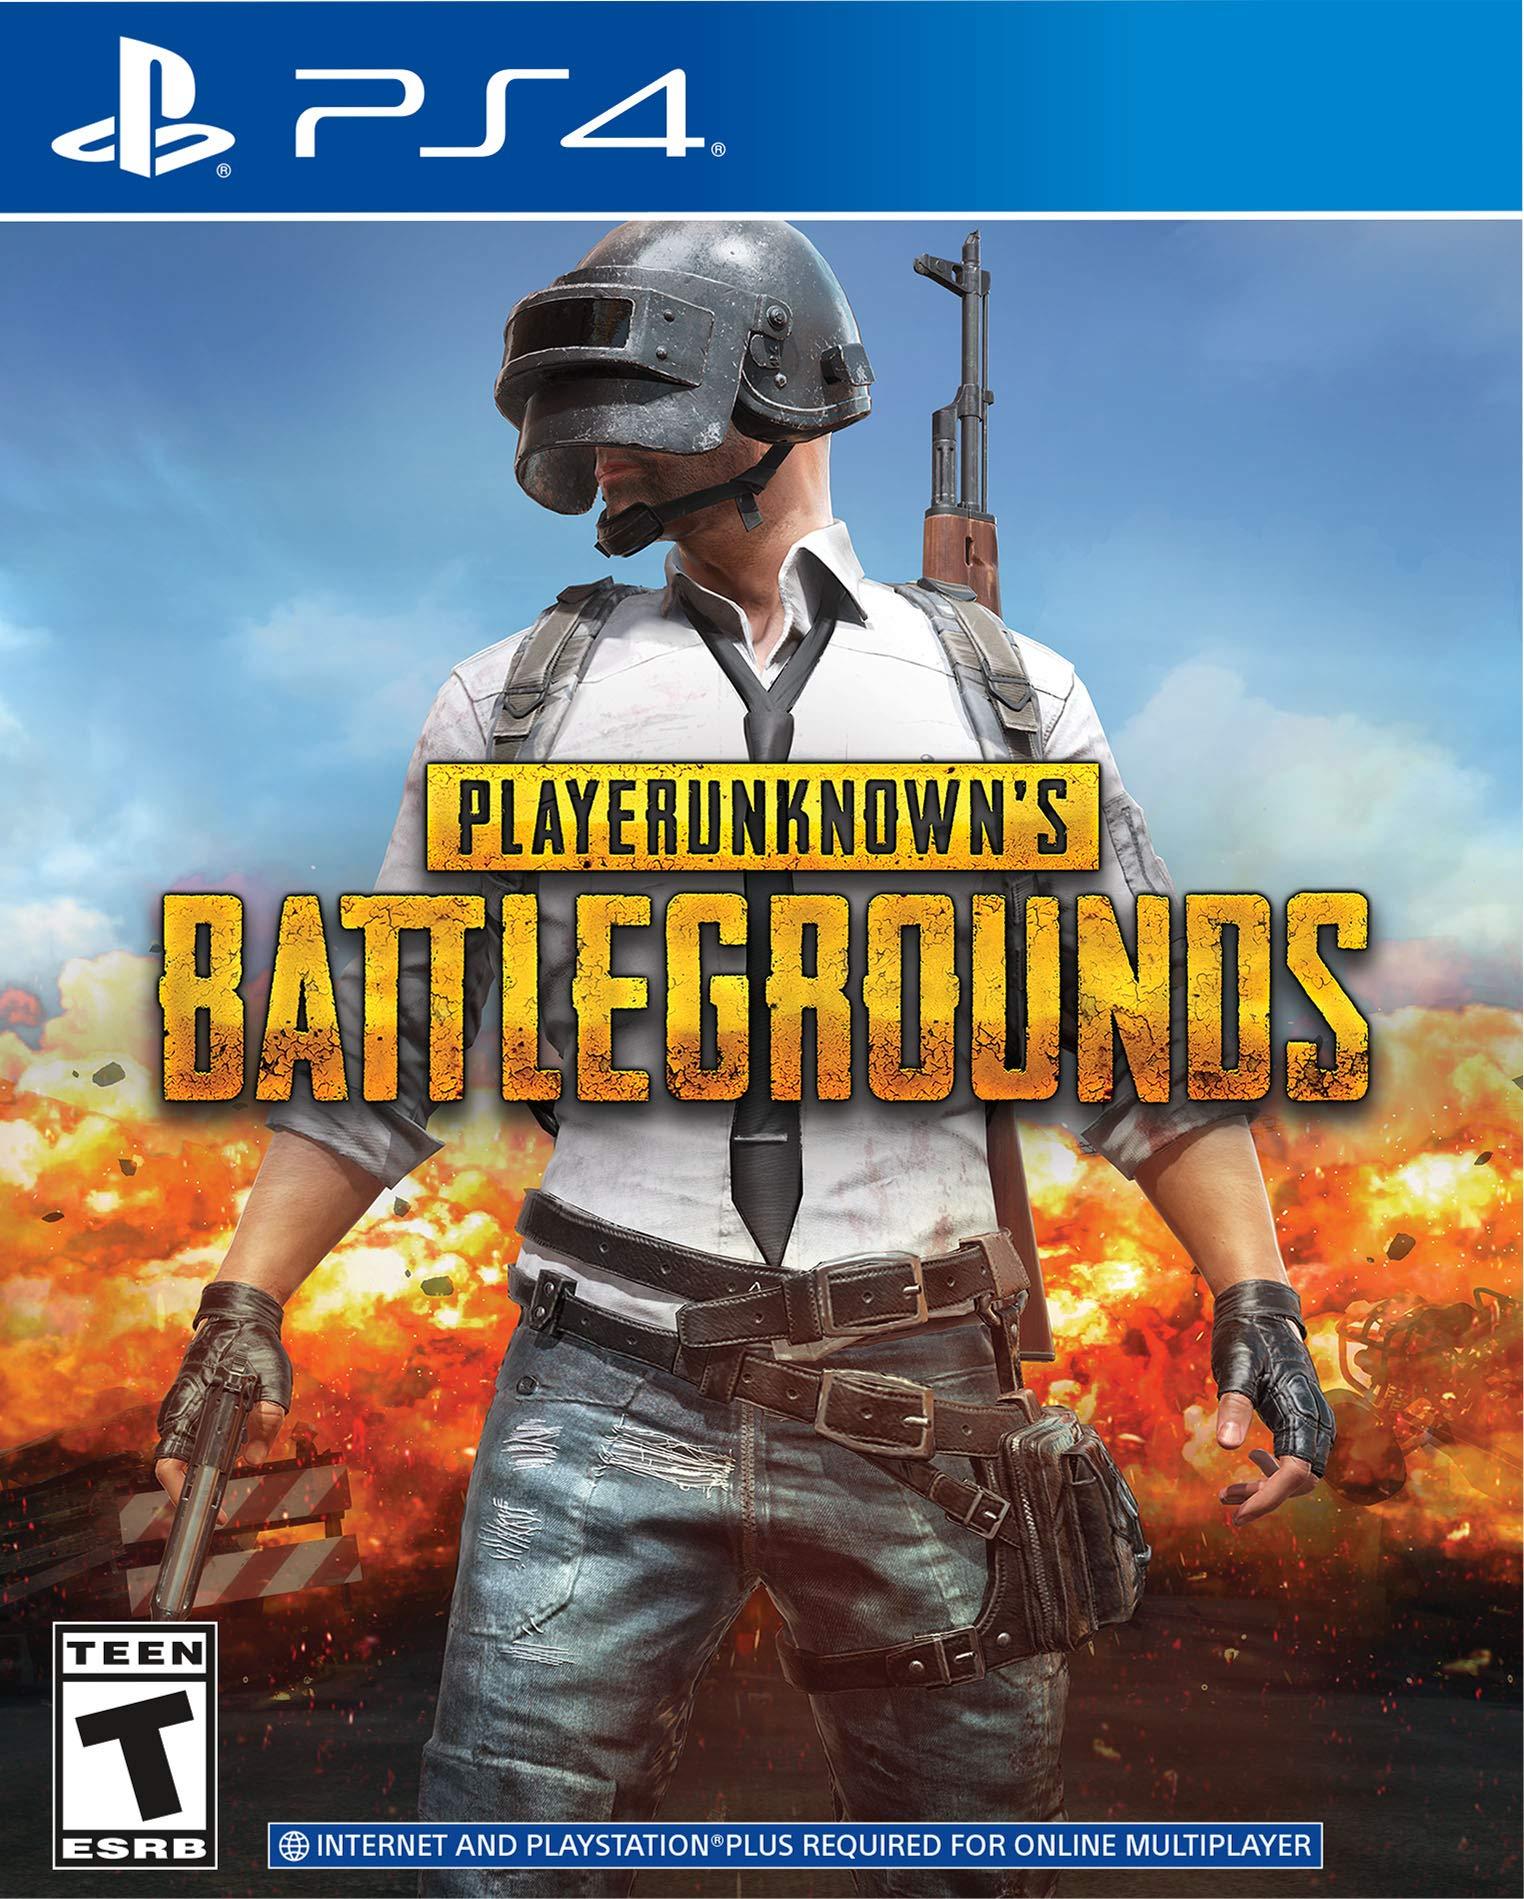 PUBG Player Unknown Battlegrounds PS4 £7.49 @ Sainsbury's instore